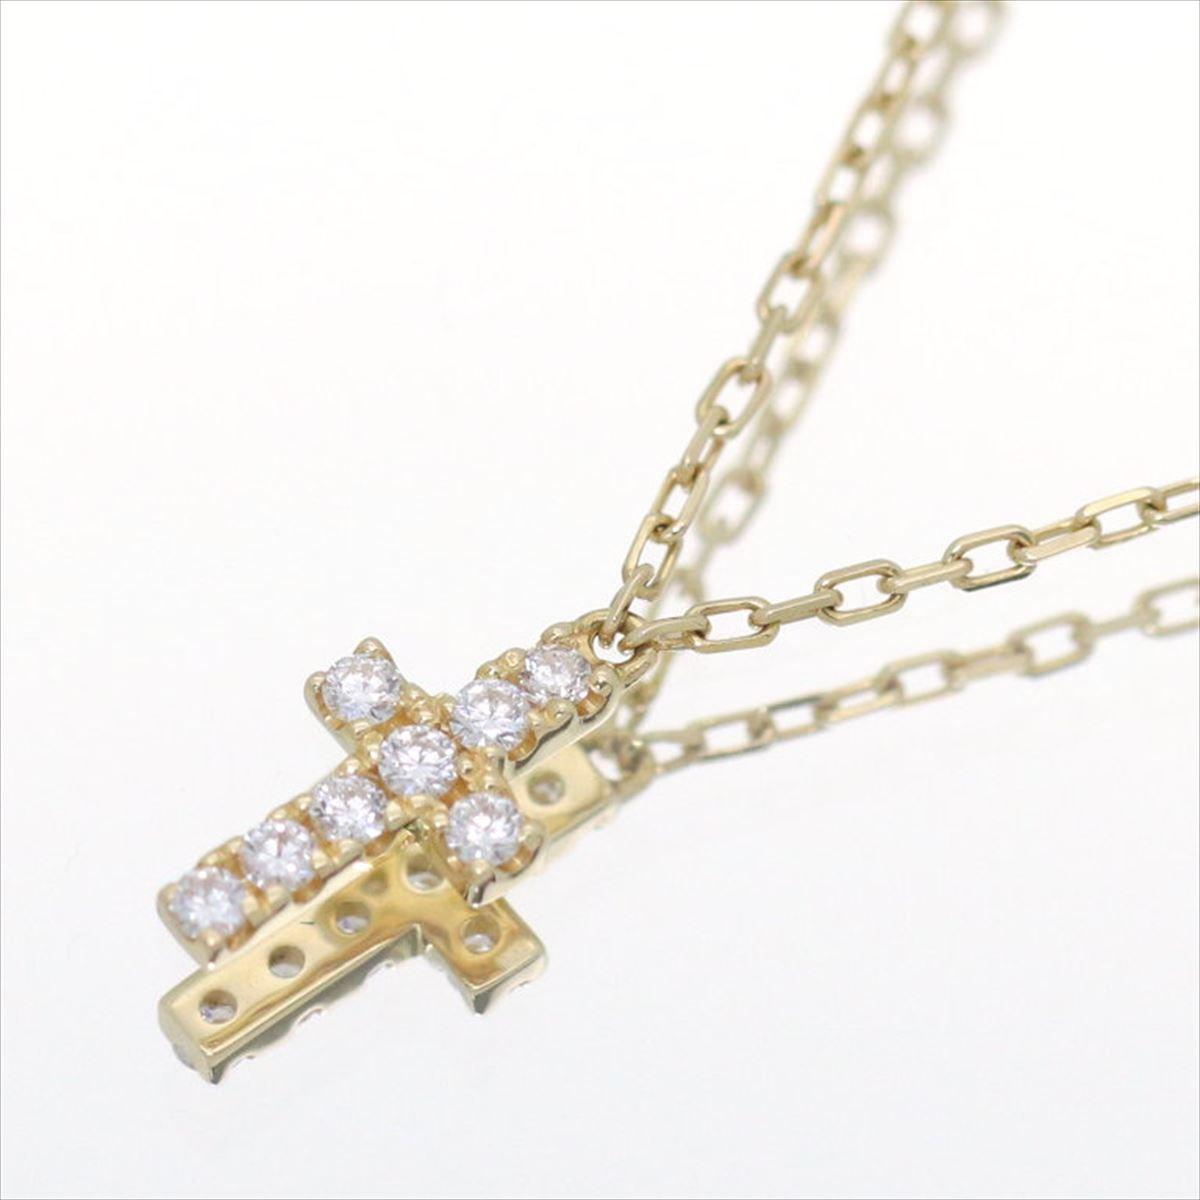 Karyon rakuten global market ahkah amp karyon rakuten global market ahkah amp one point diagram necklace ladys k18yg yellow gold diamond approximately 40cm length ccuart Choice Image